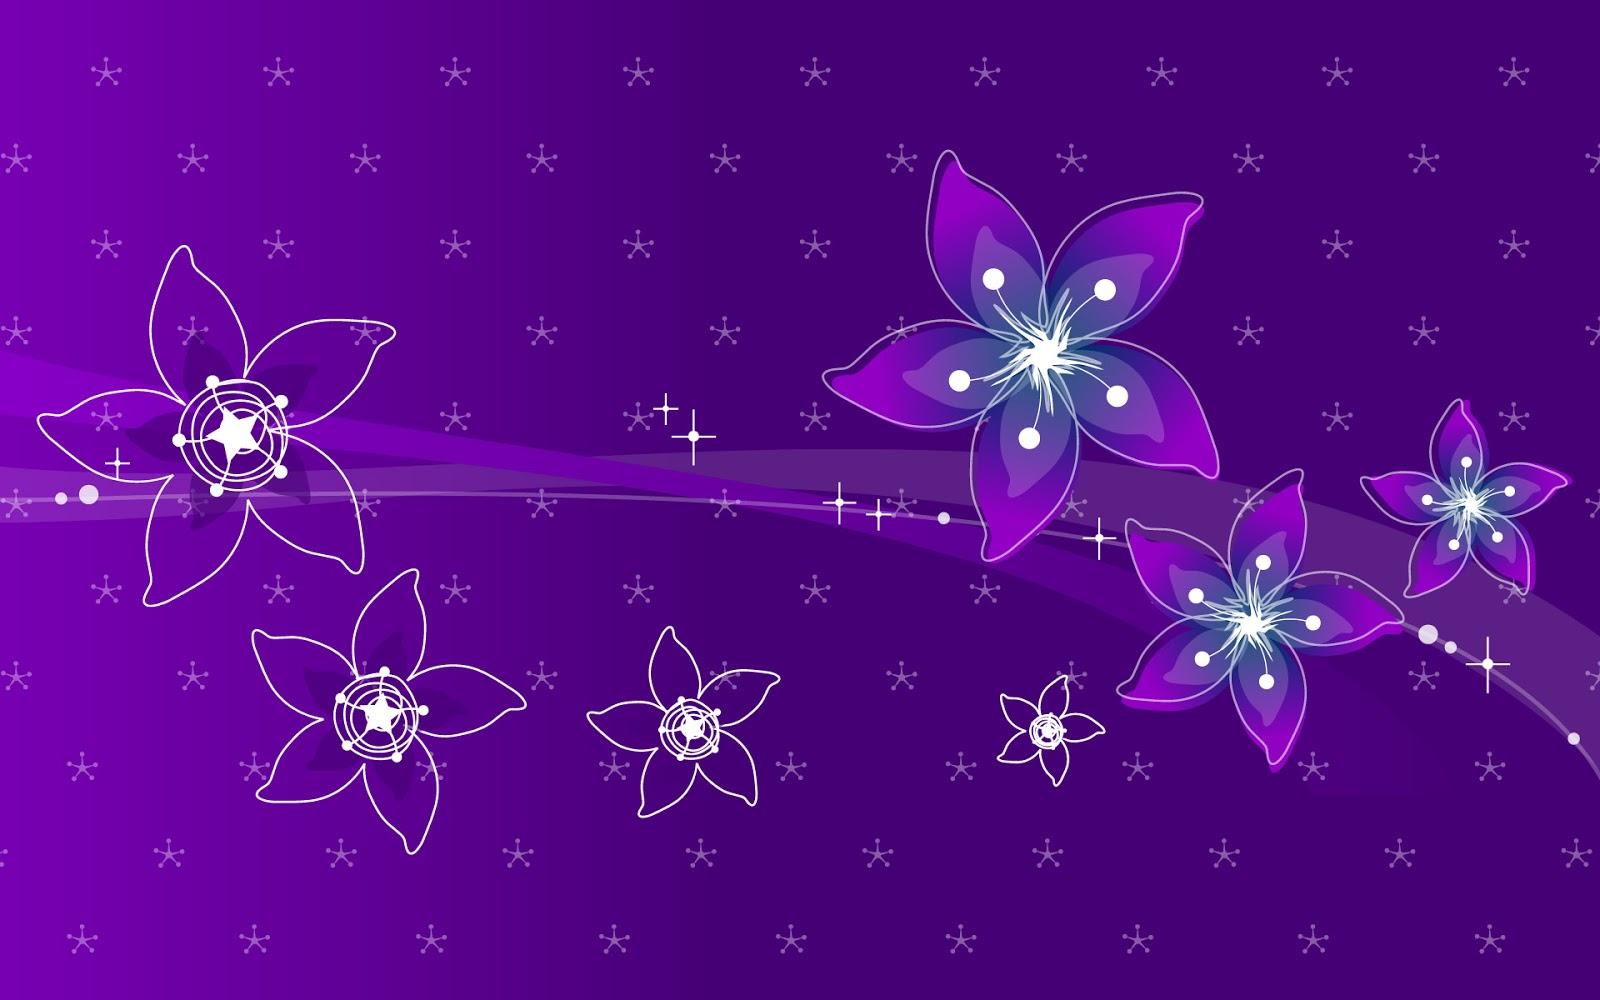 hoa phăng màu tím